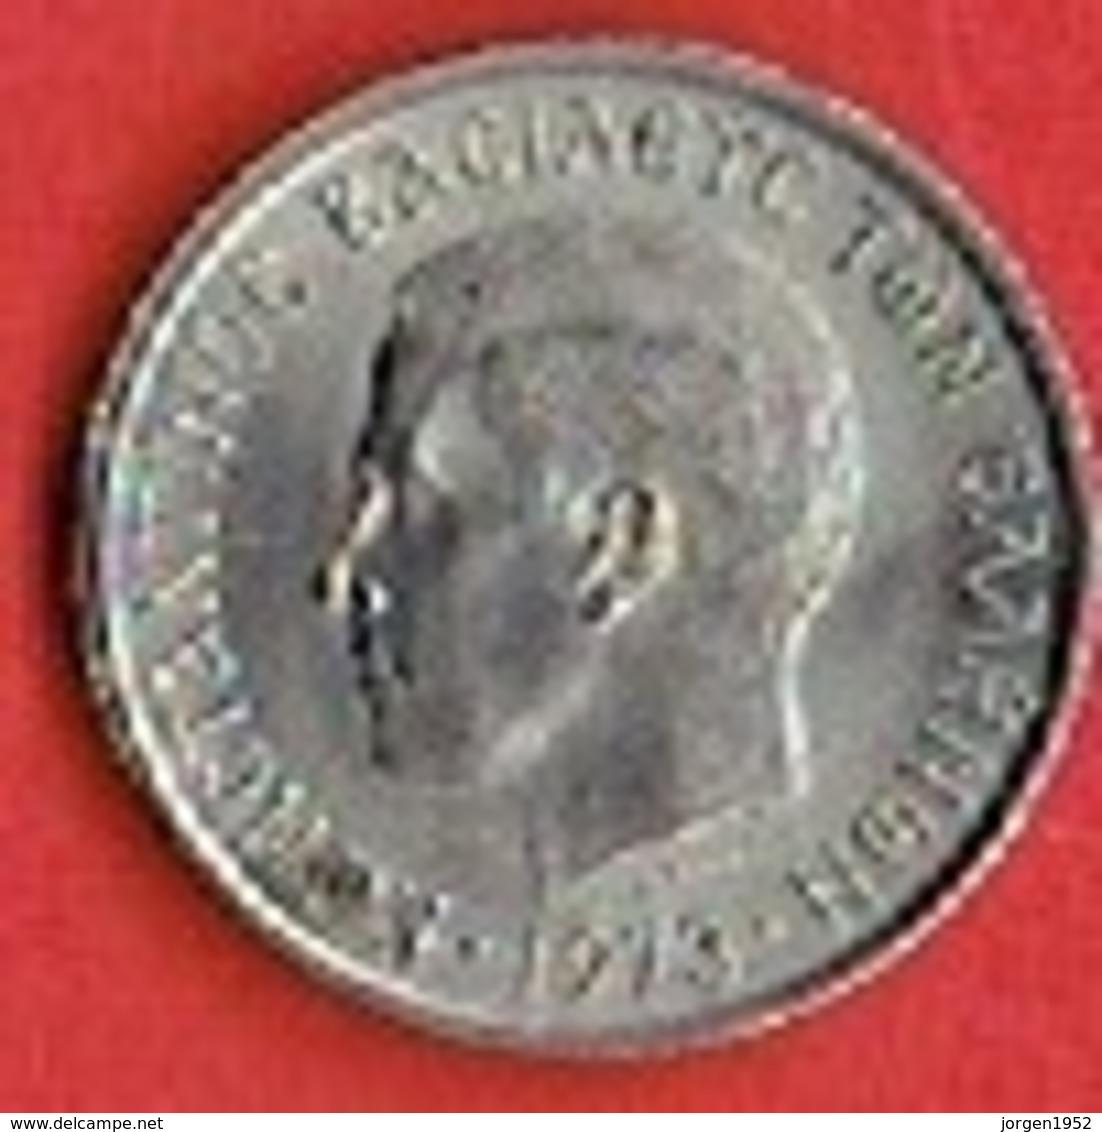 GREECE #  2 Drachmes  FROM 1967 - Grèce